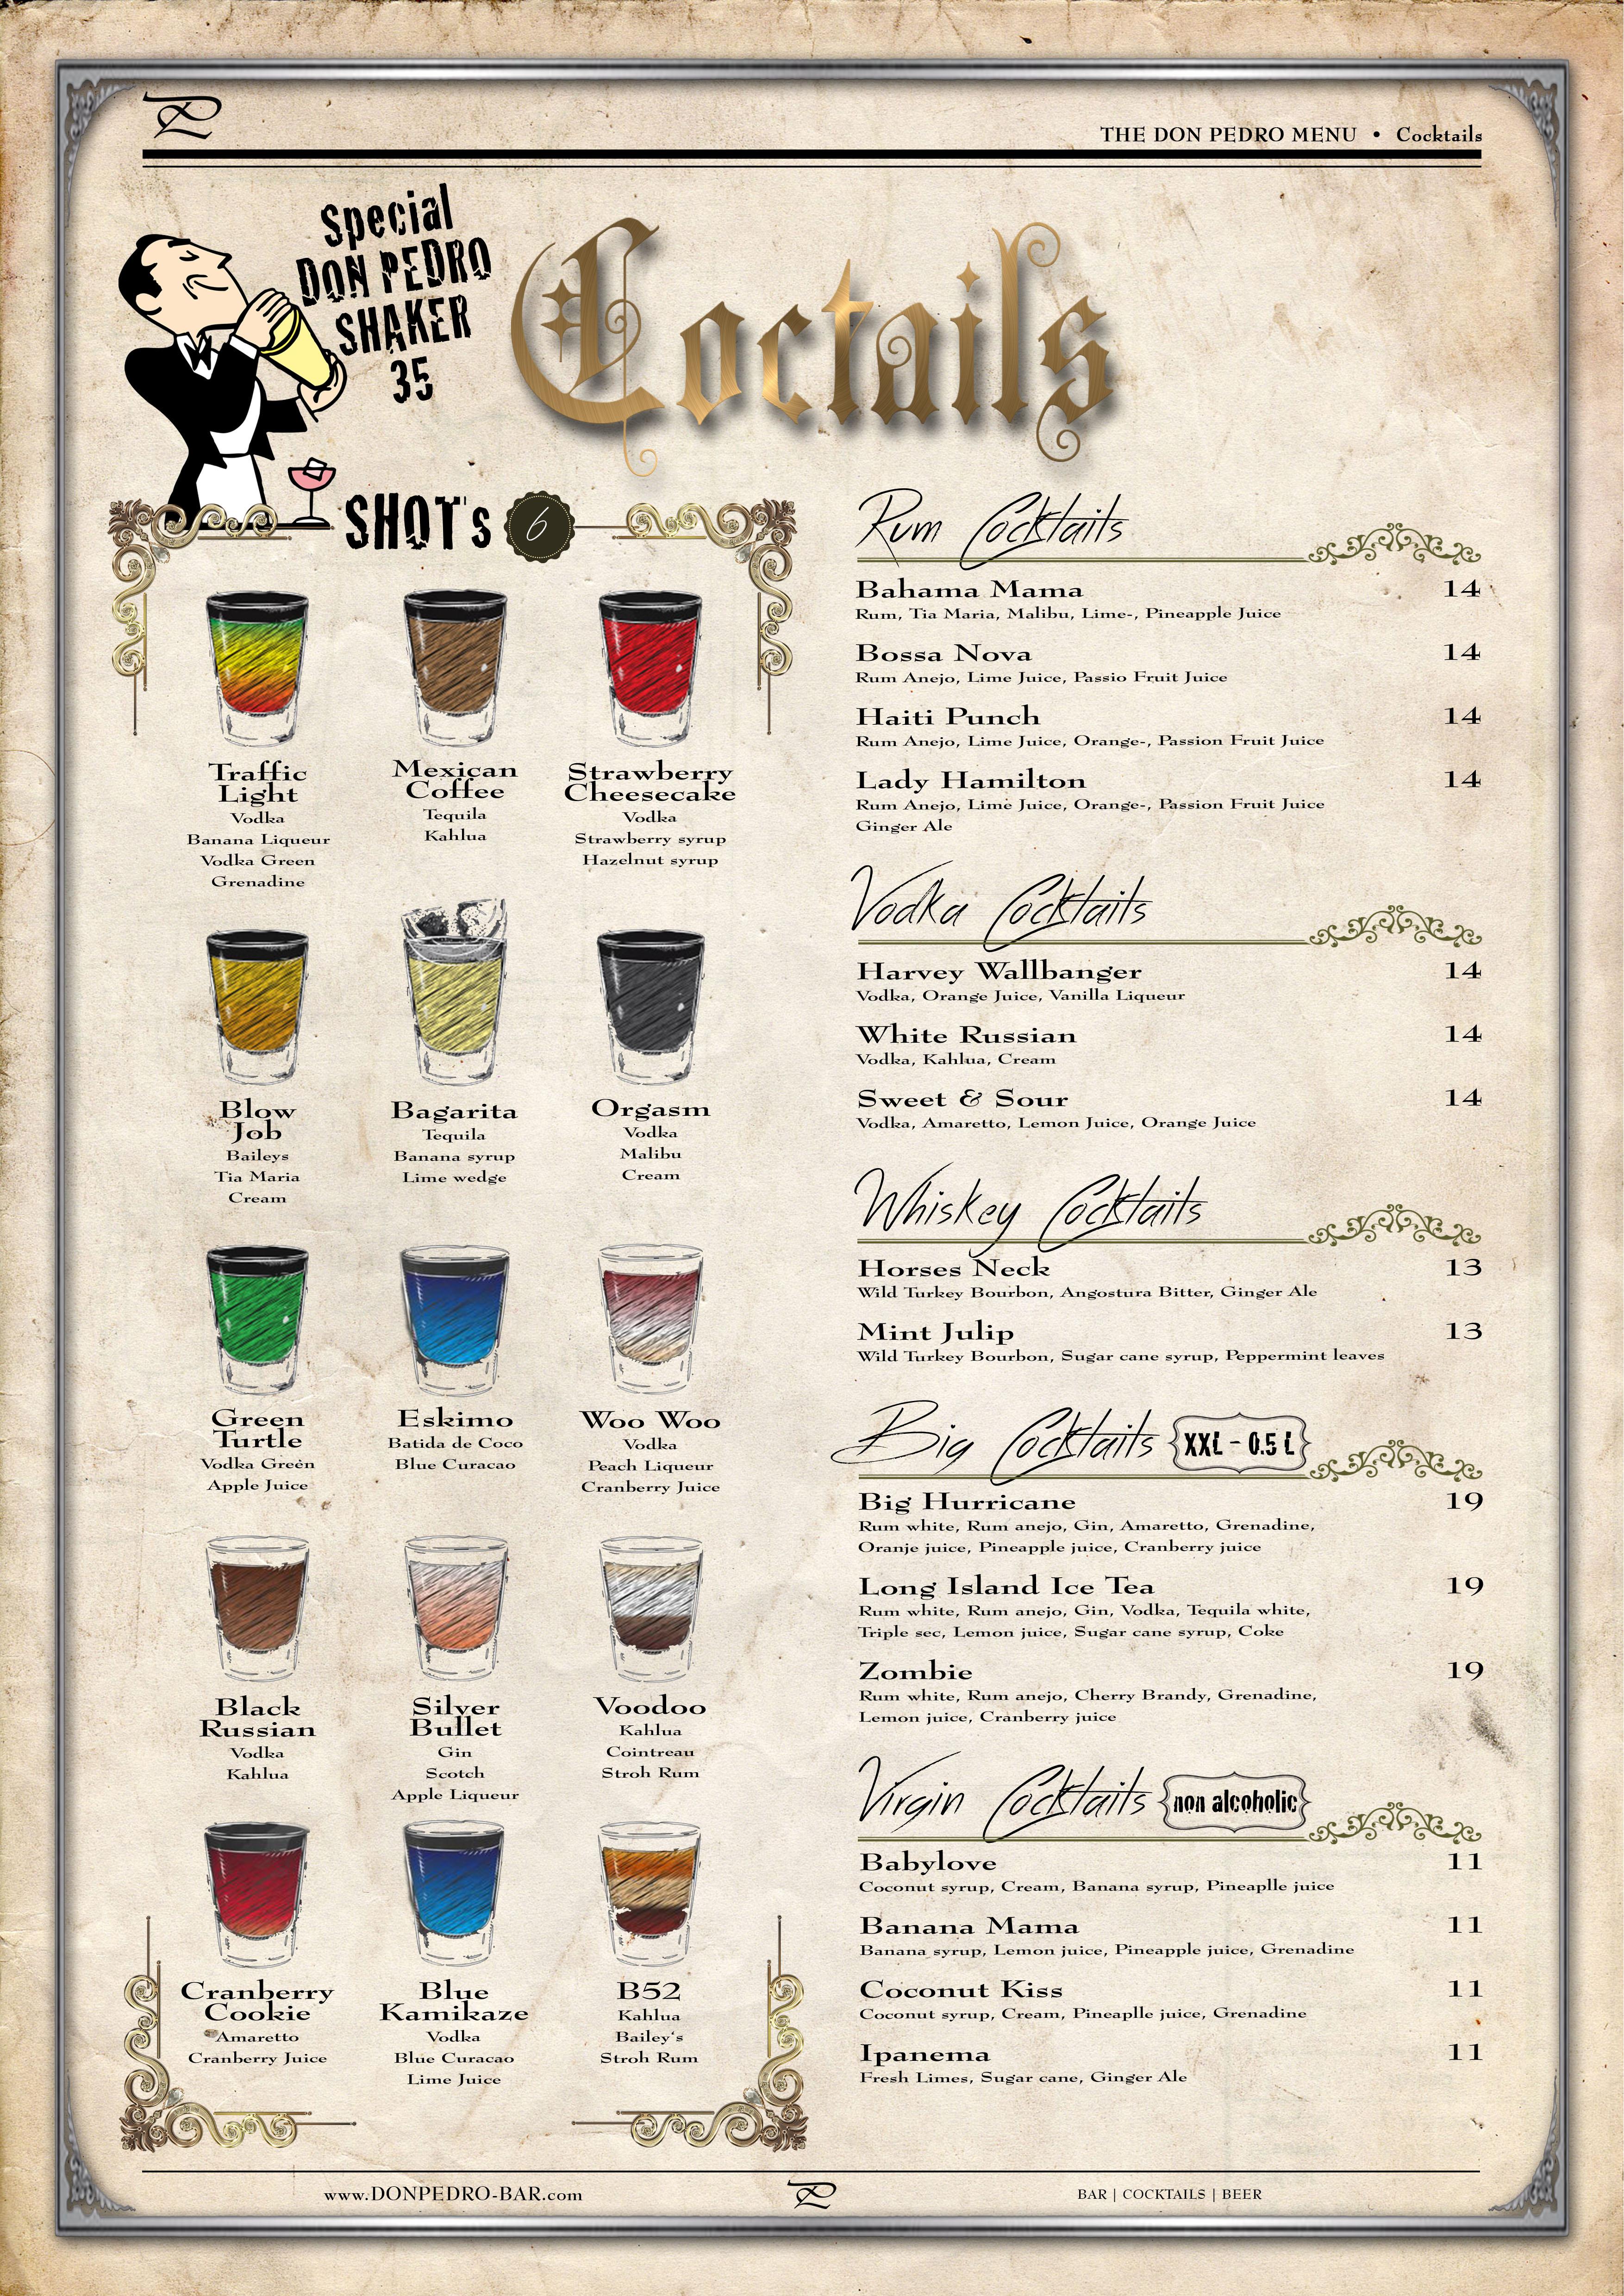 THE DON PEDRO MENU Cocktails